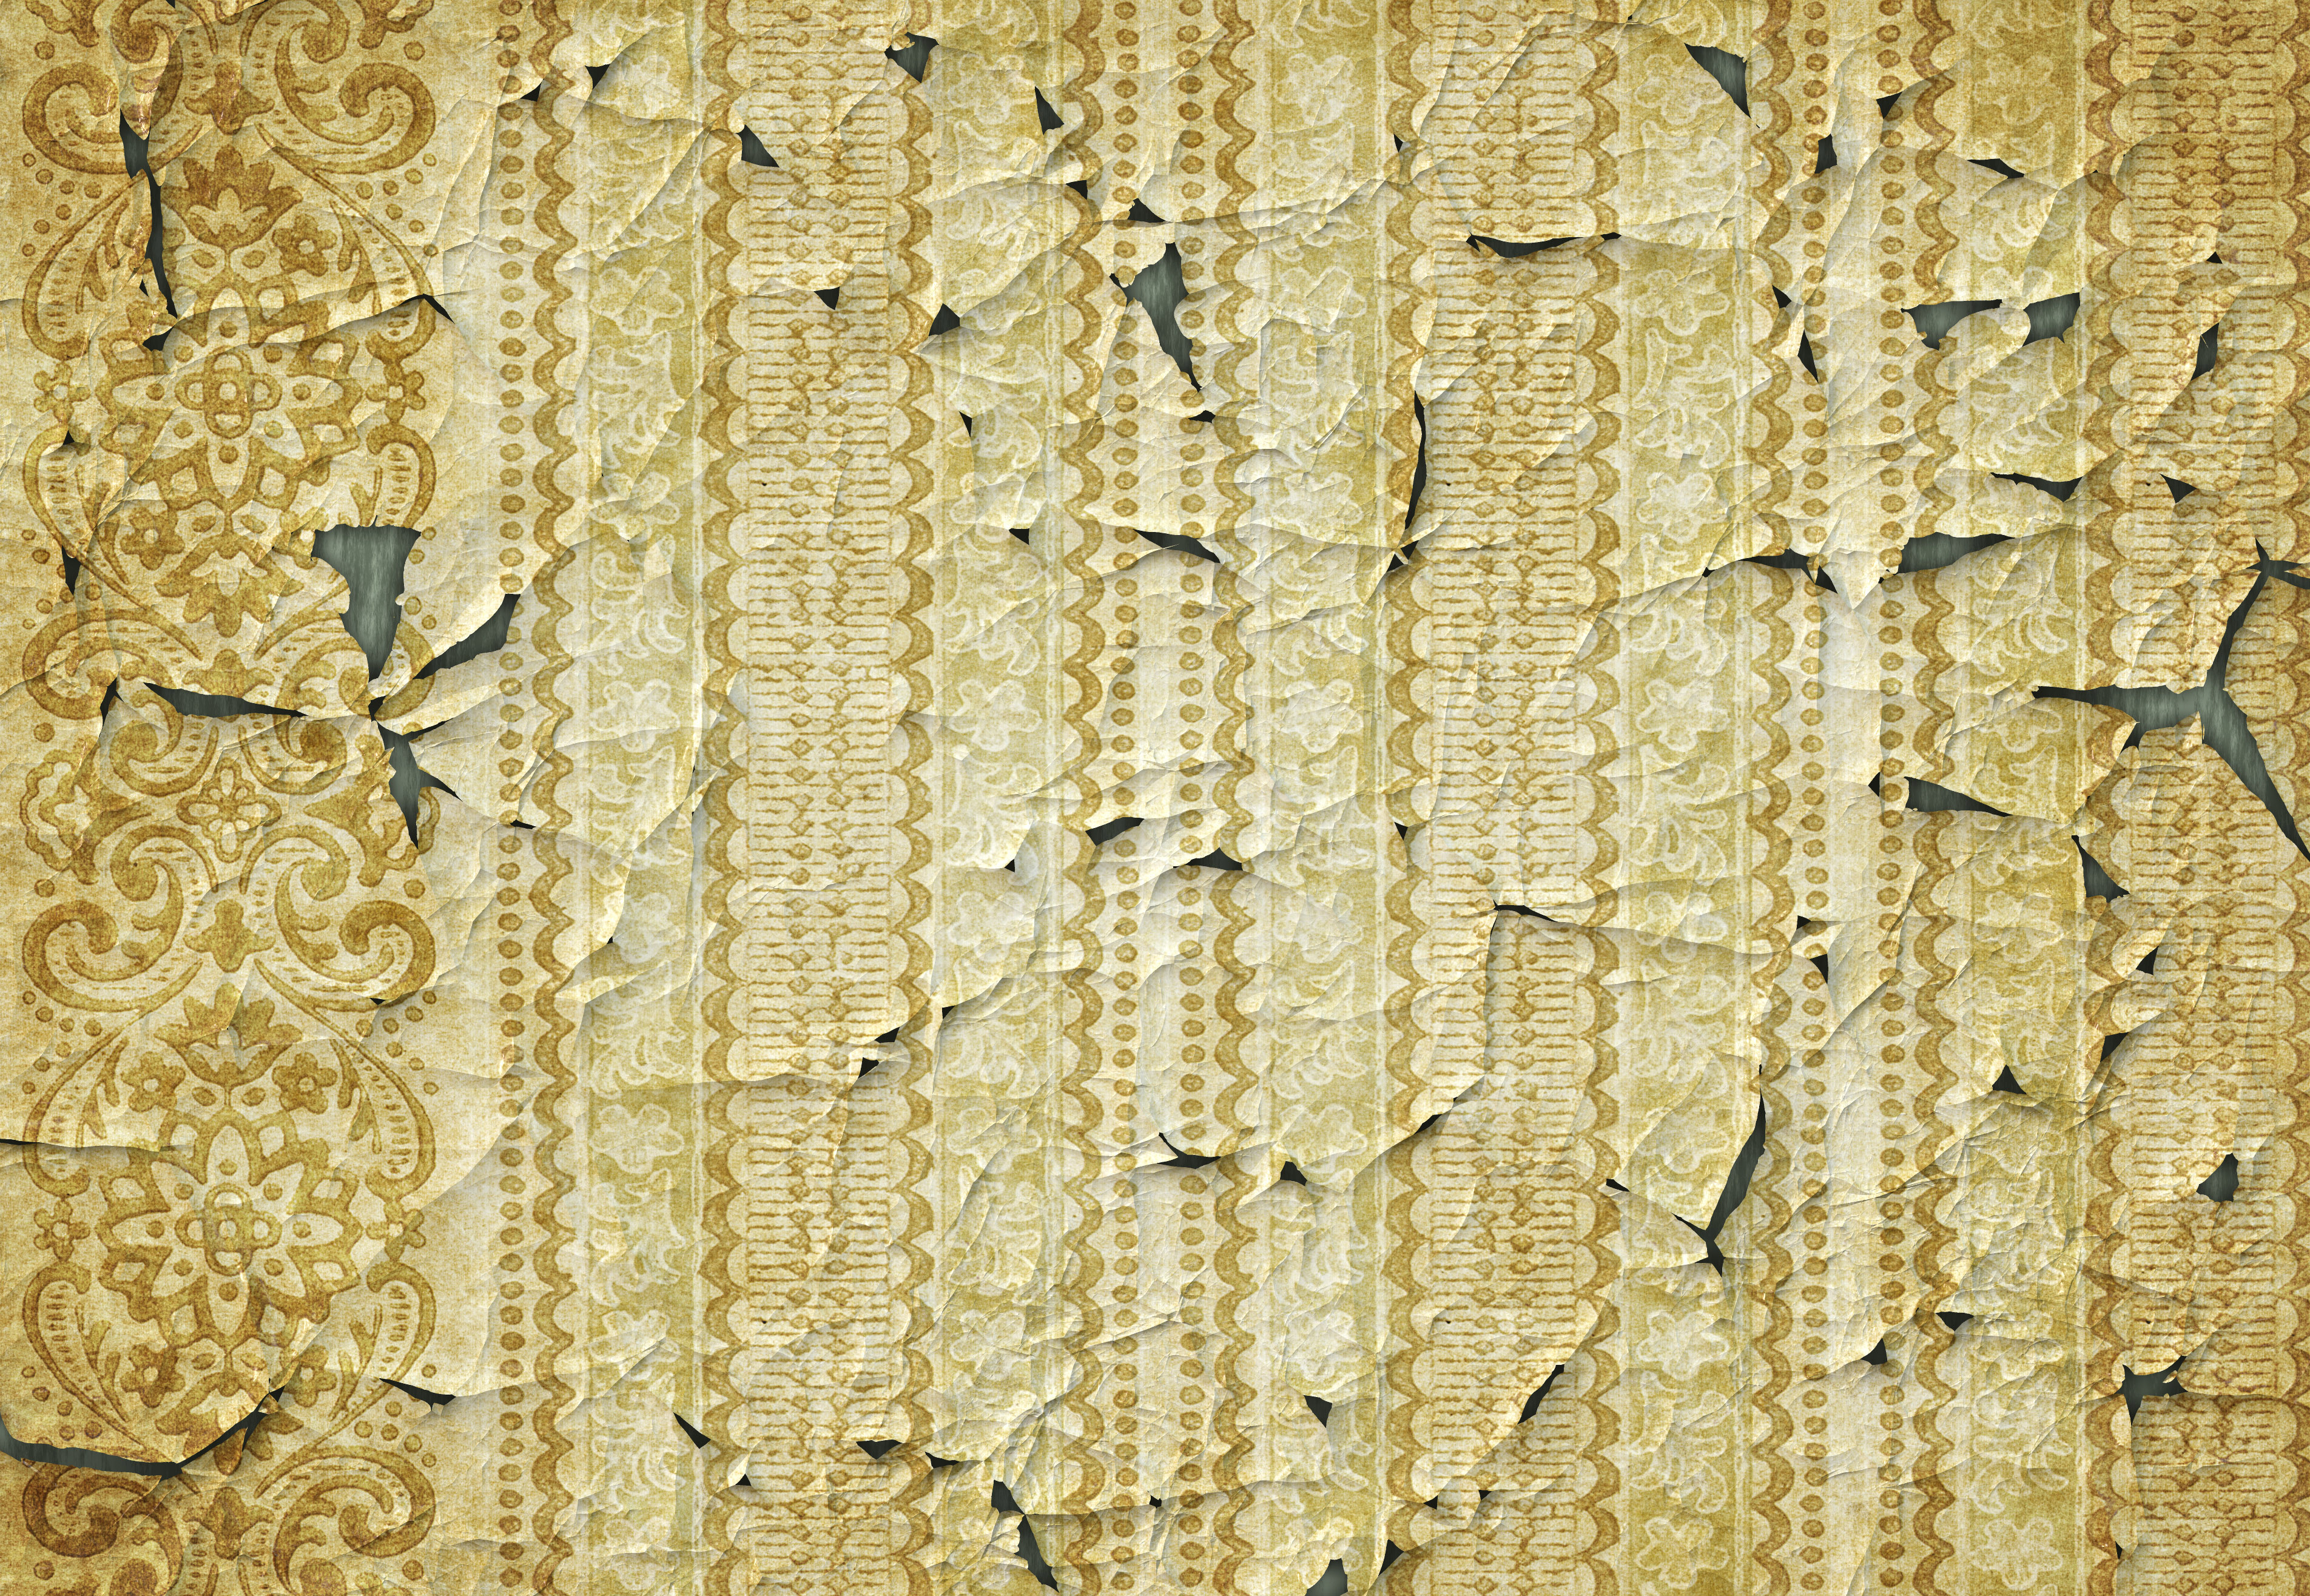 rendered torn wallpaper paper background texture 3808x2631